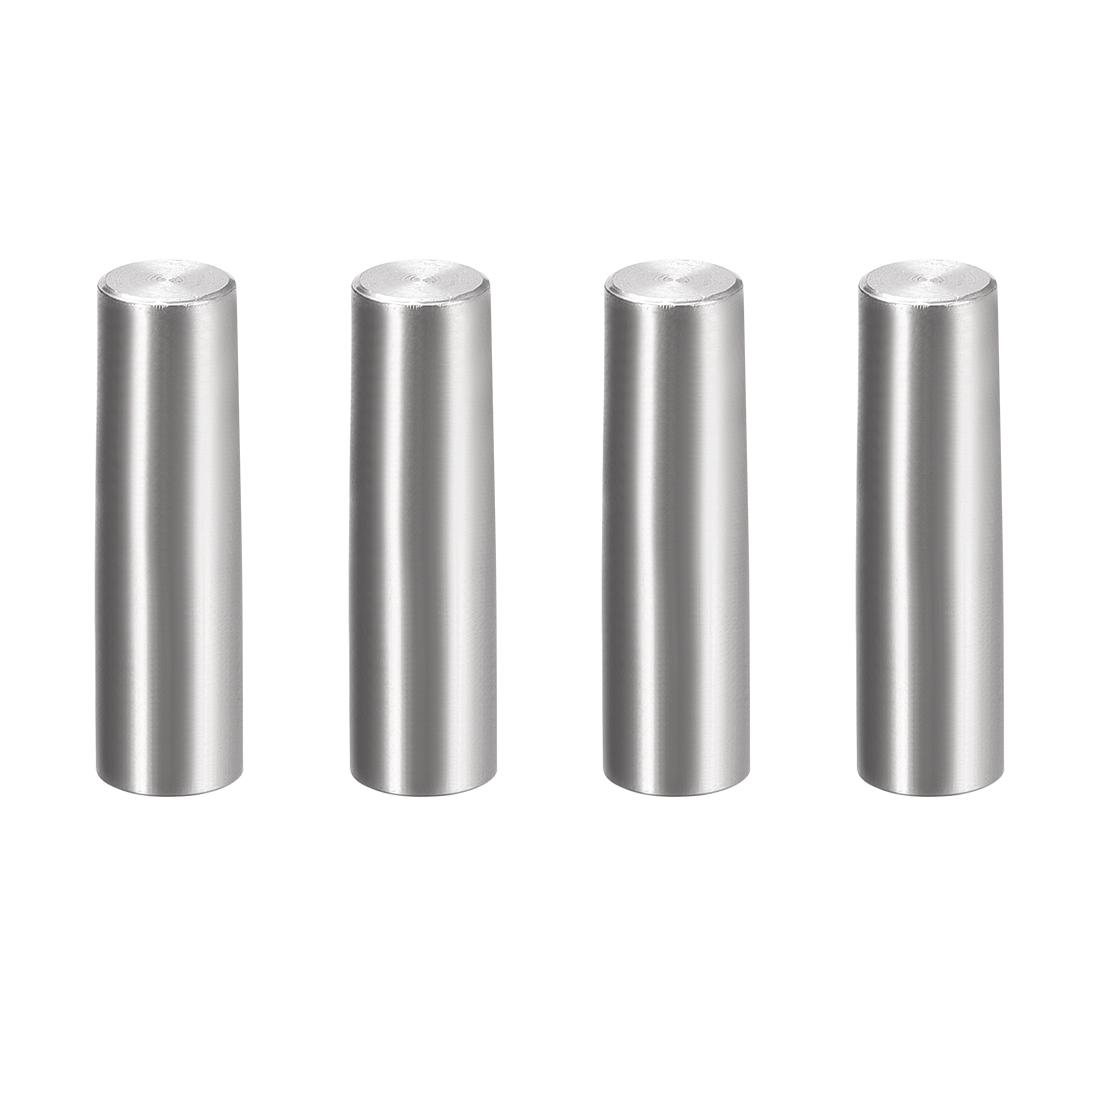 4Pcs 8mm x 30mm 1:50 Taper Pin 304 Stainless Steel Shelf Support Pin Fasten